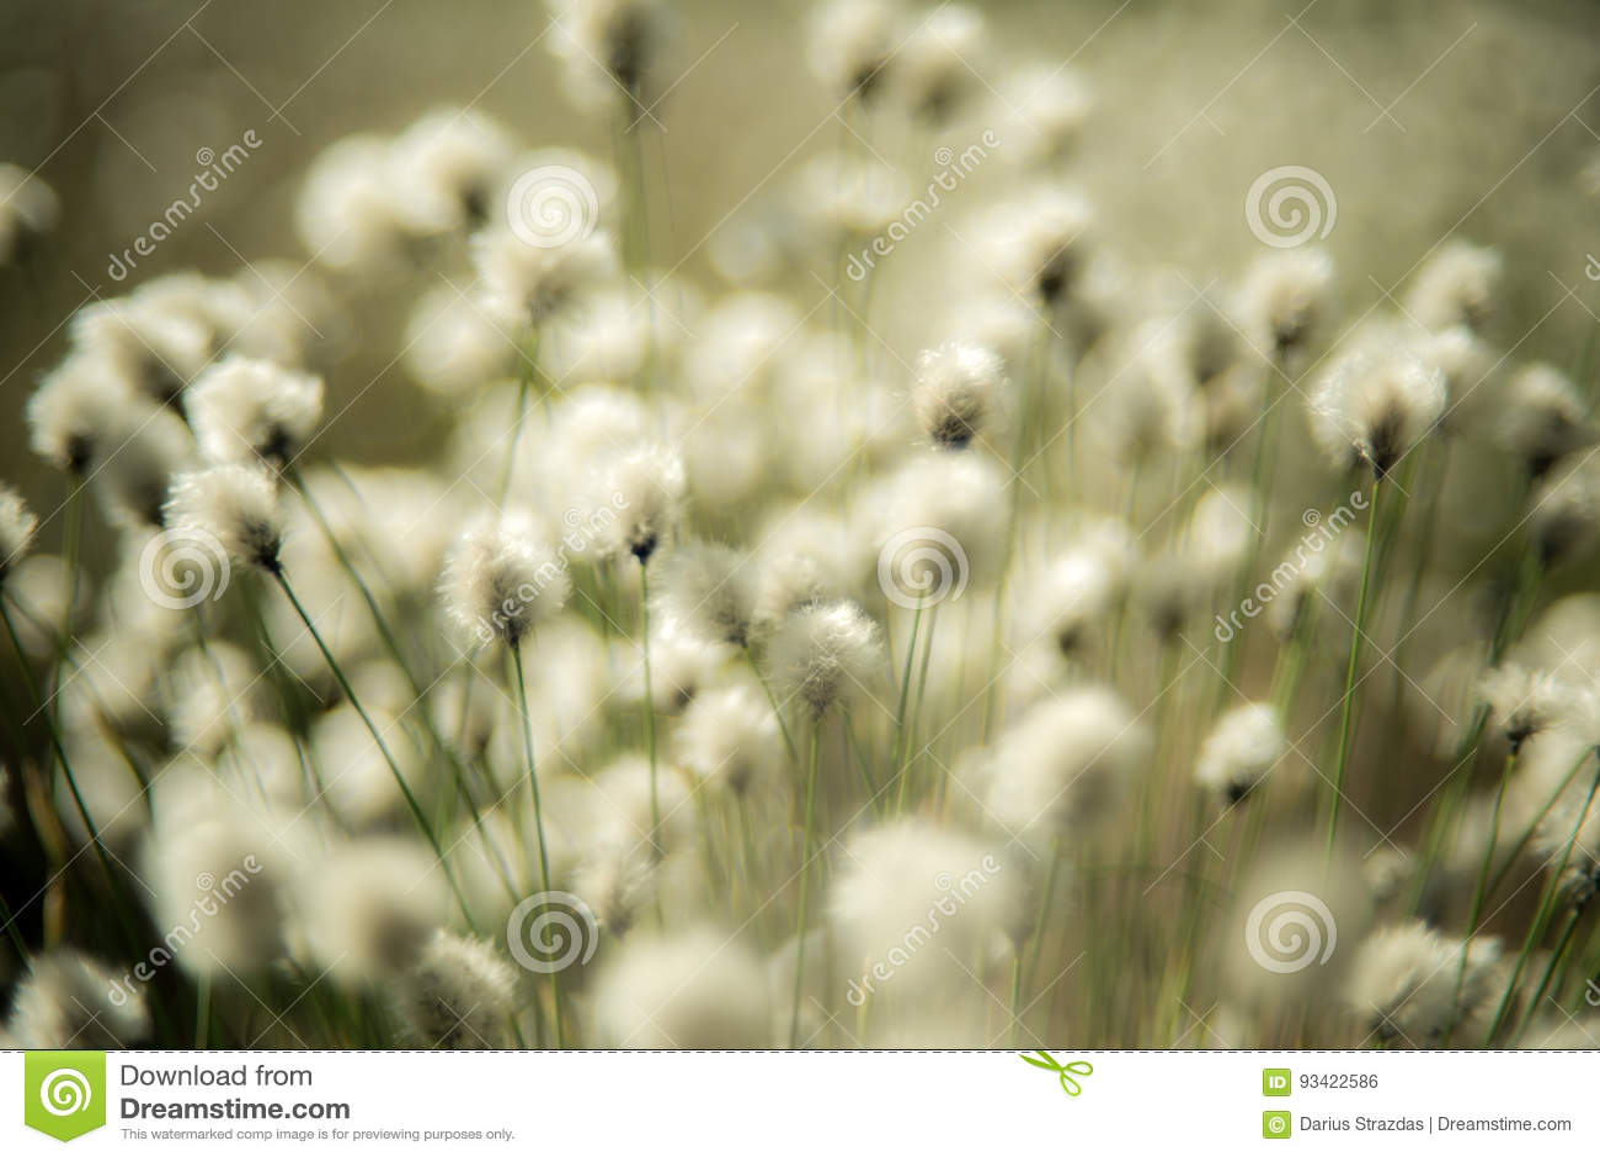 Fond mou d usine d herbe